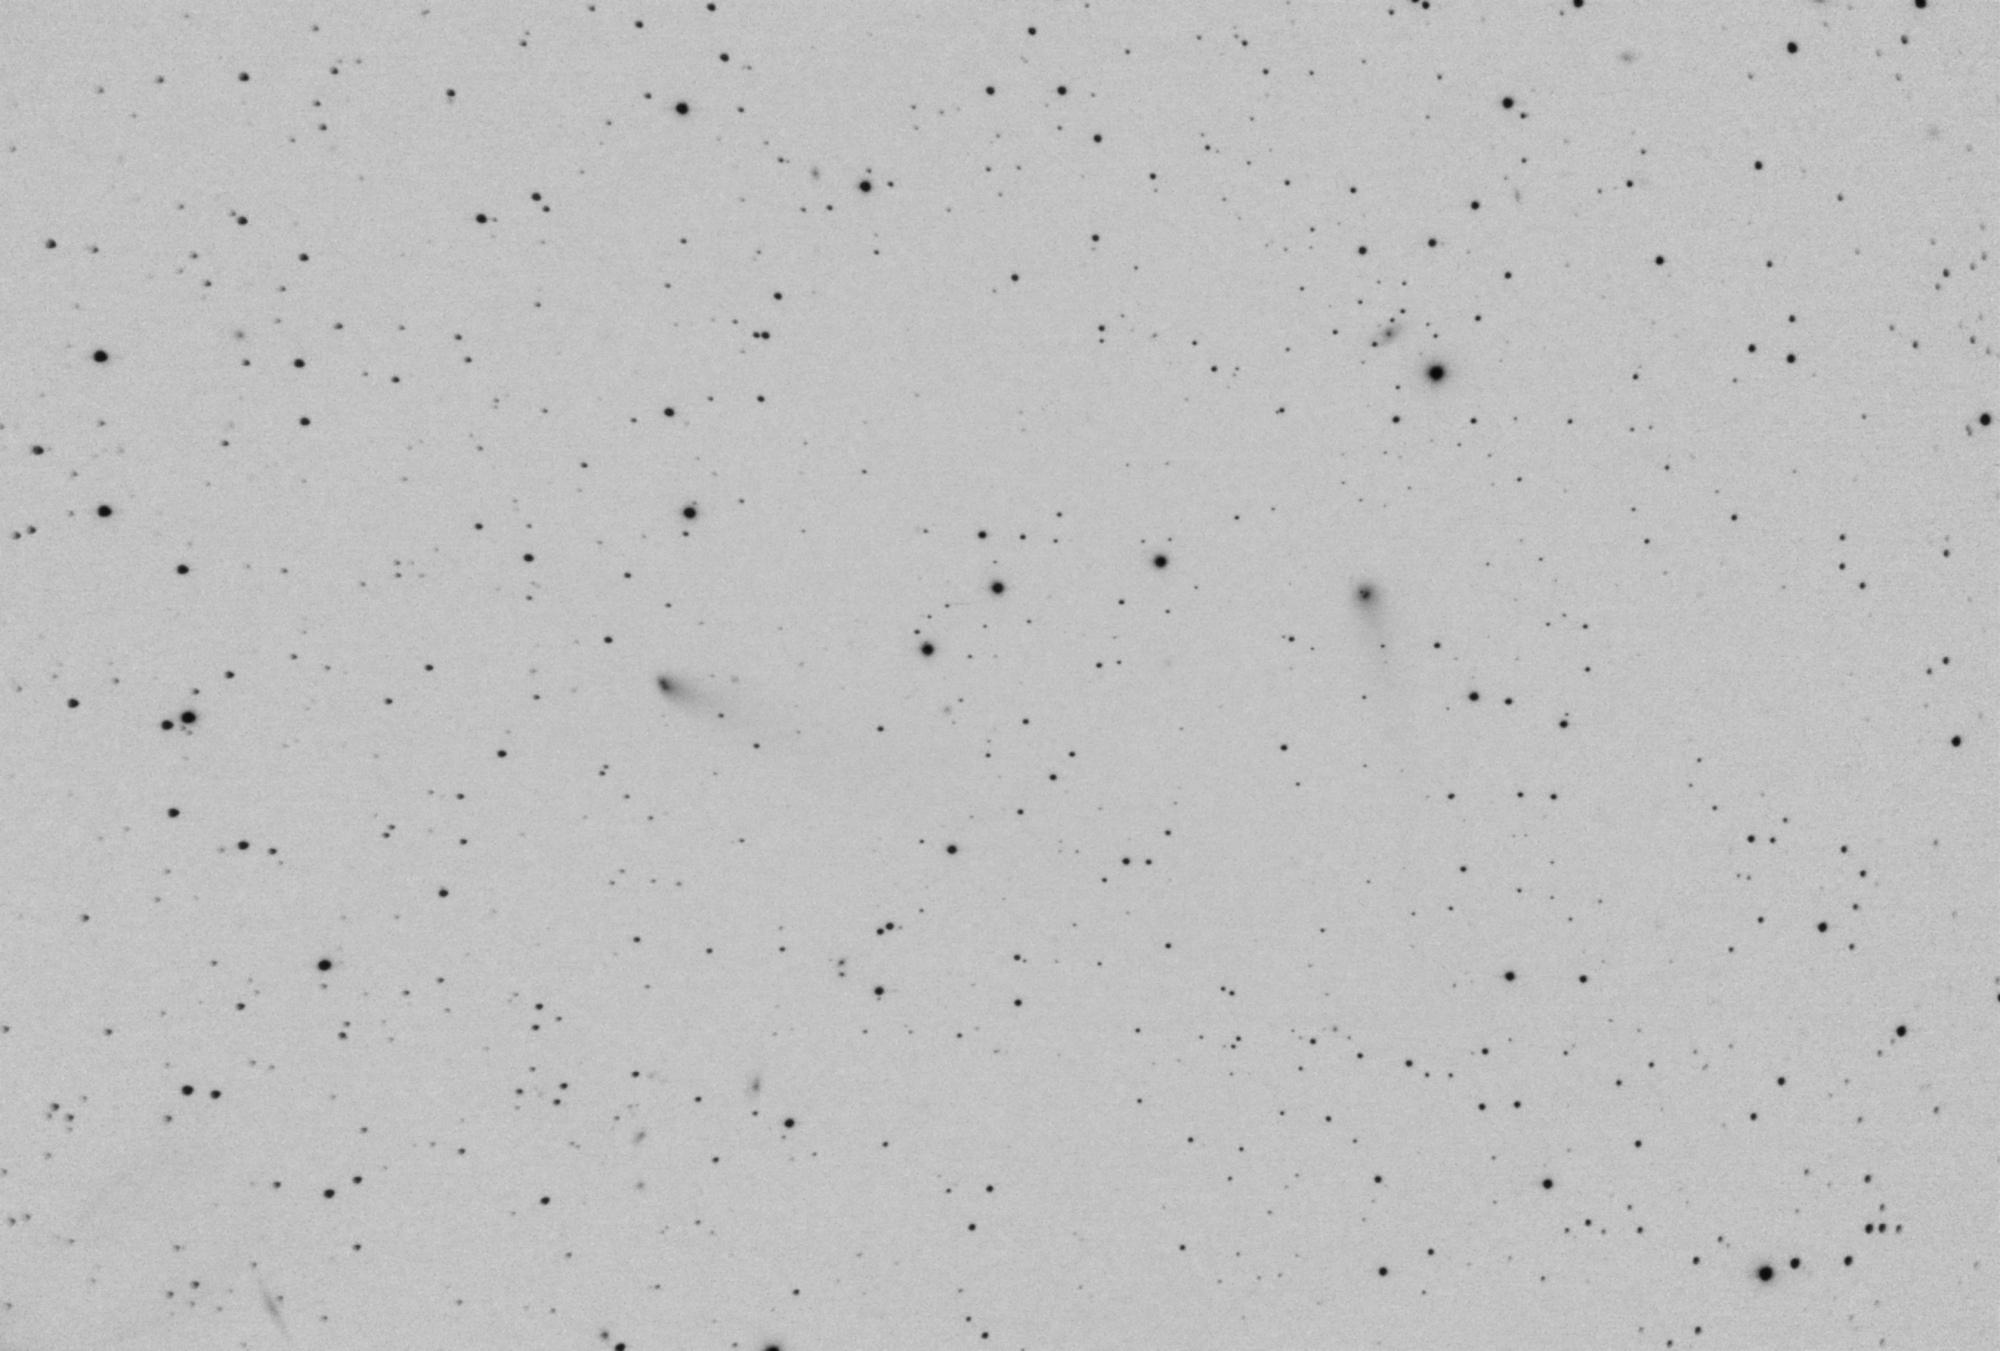 260P-2018N2-PSBW.jpg